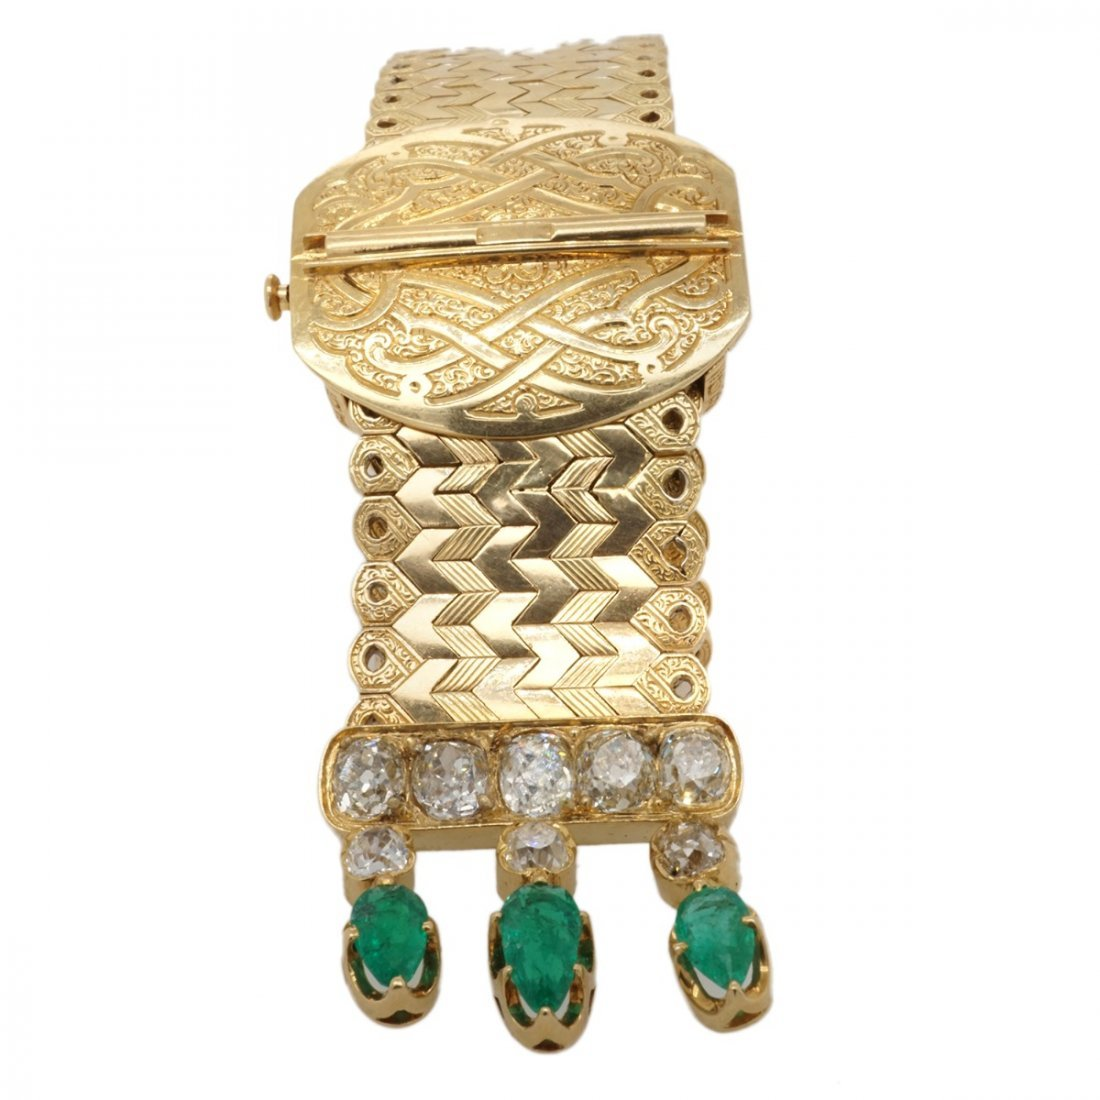 FRENCH EMERALD DIAMOND 18 KARAT GOLD BRACELET - 3